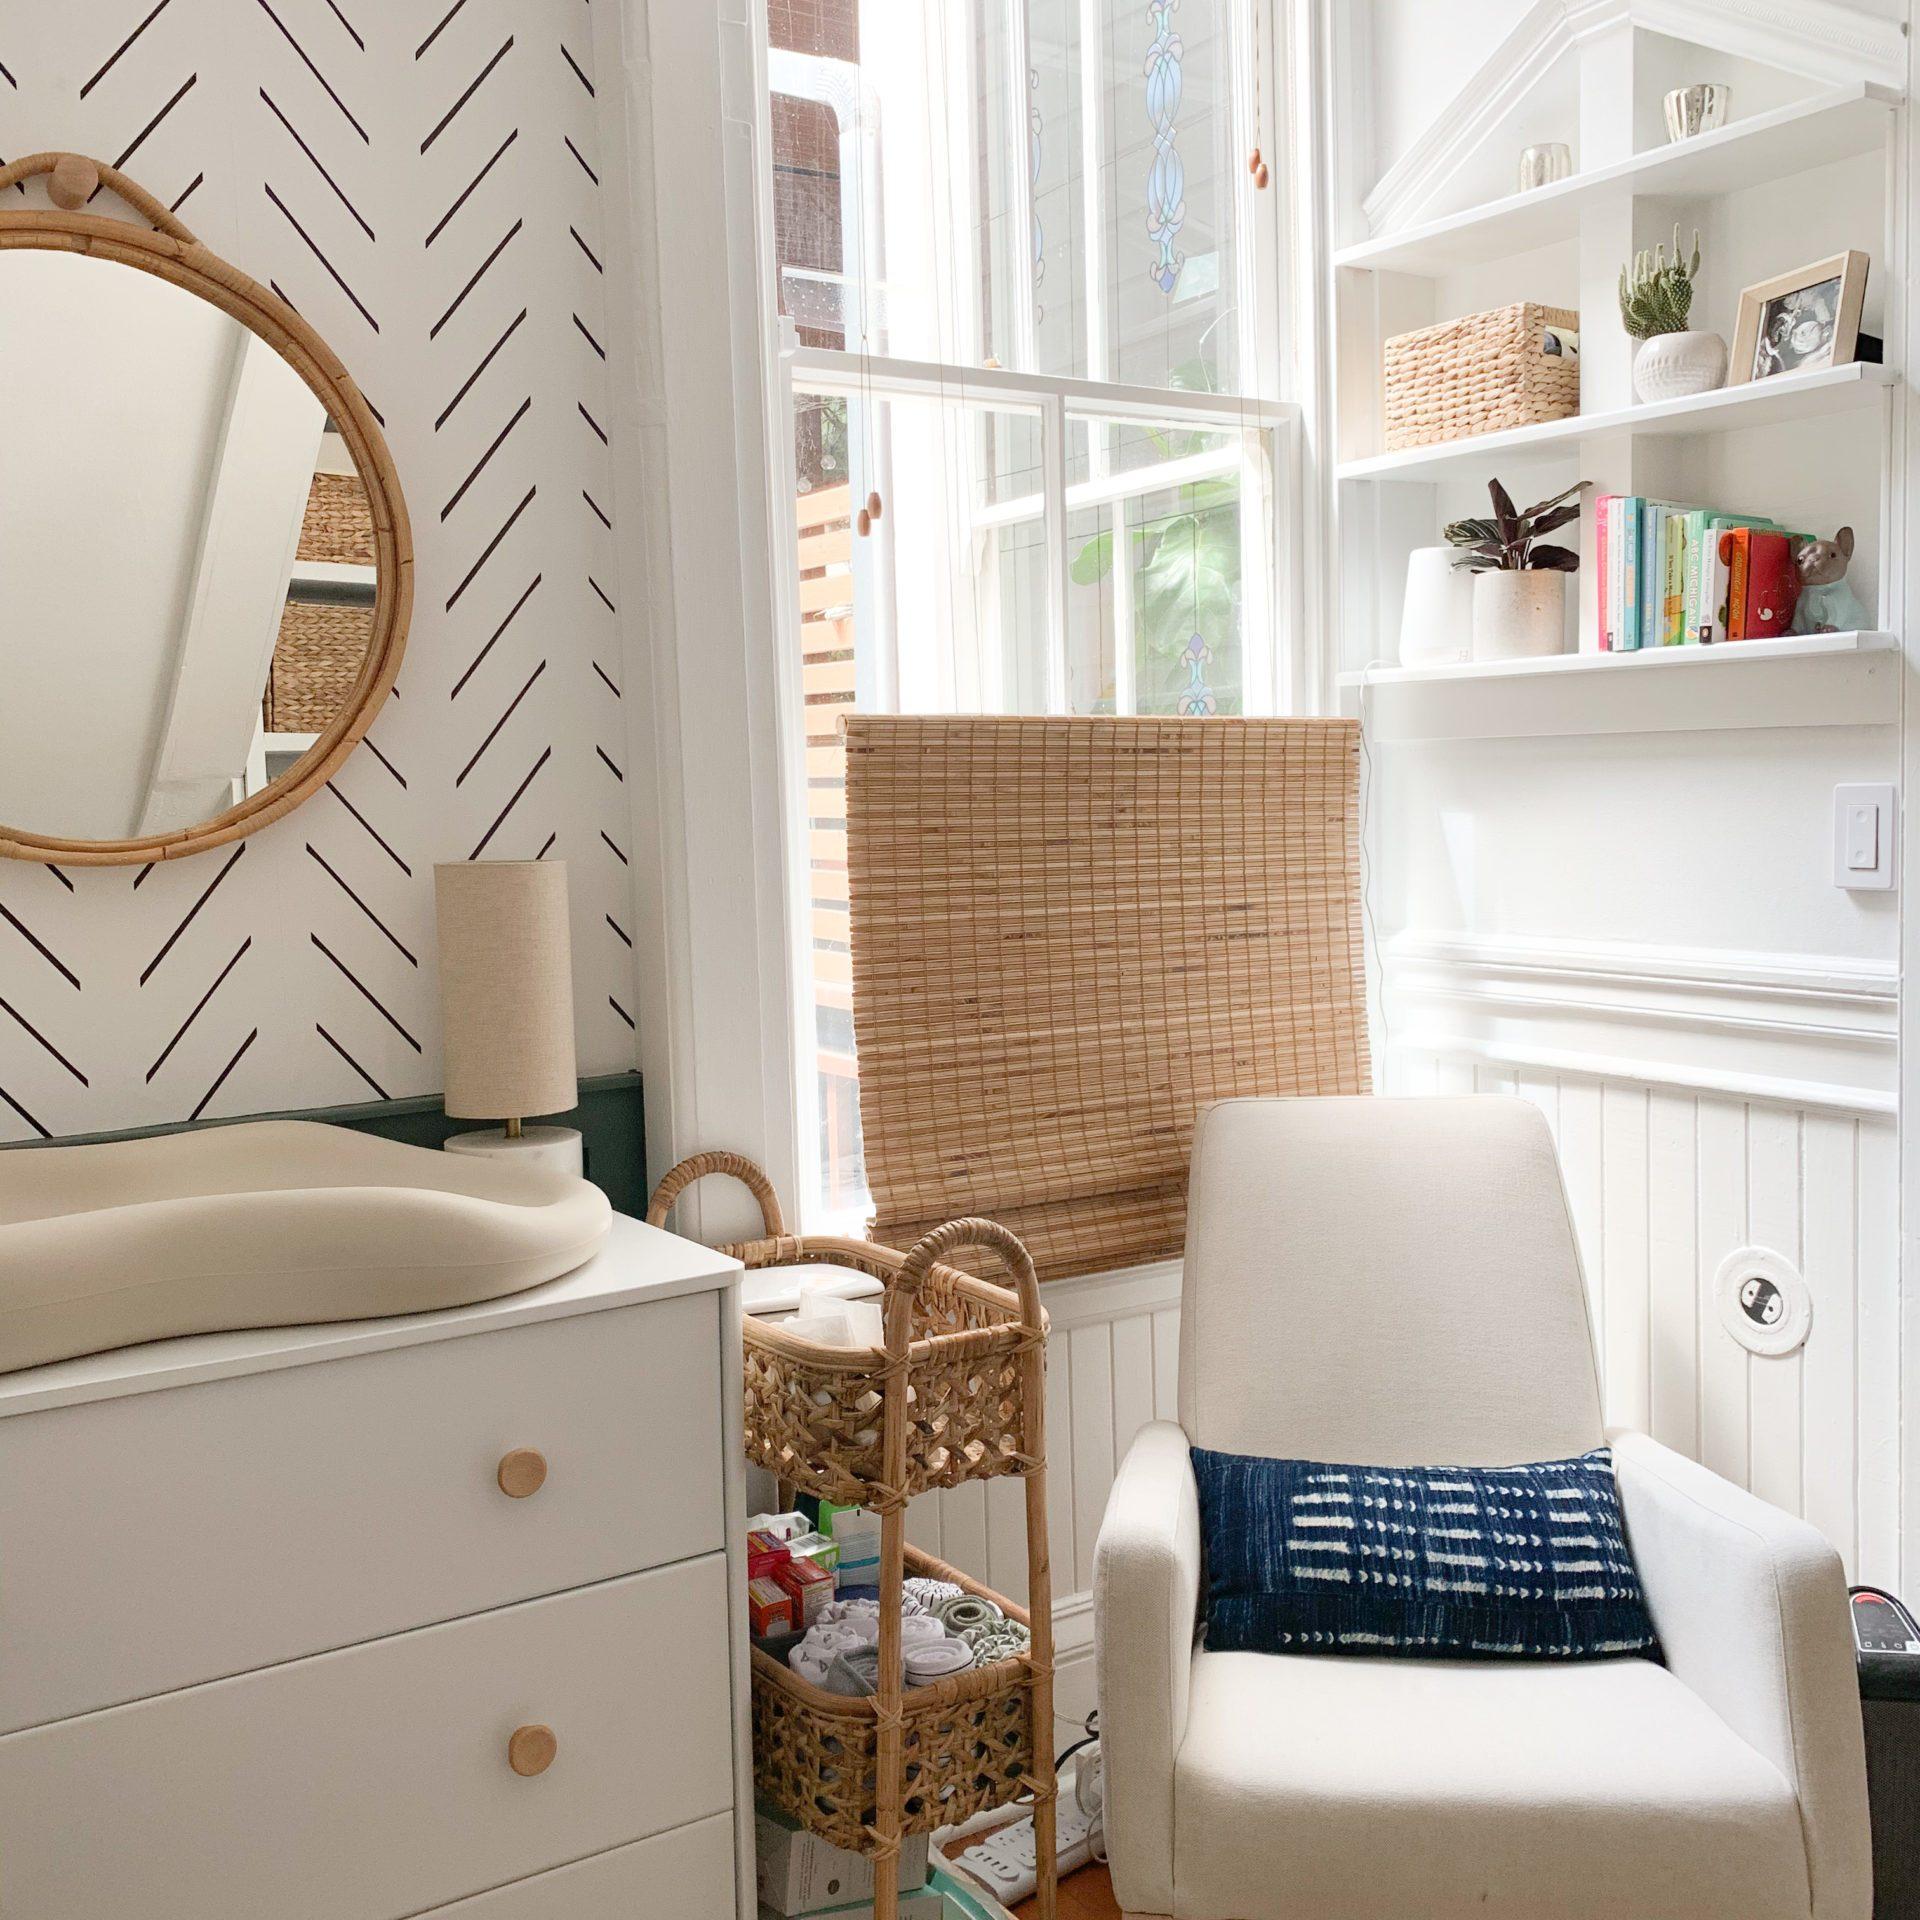 The Closet Nursery: Small Space Nursery Design